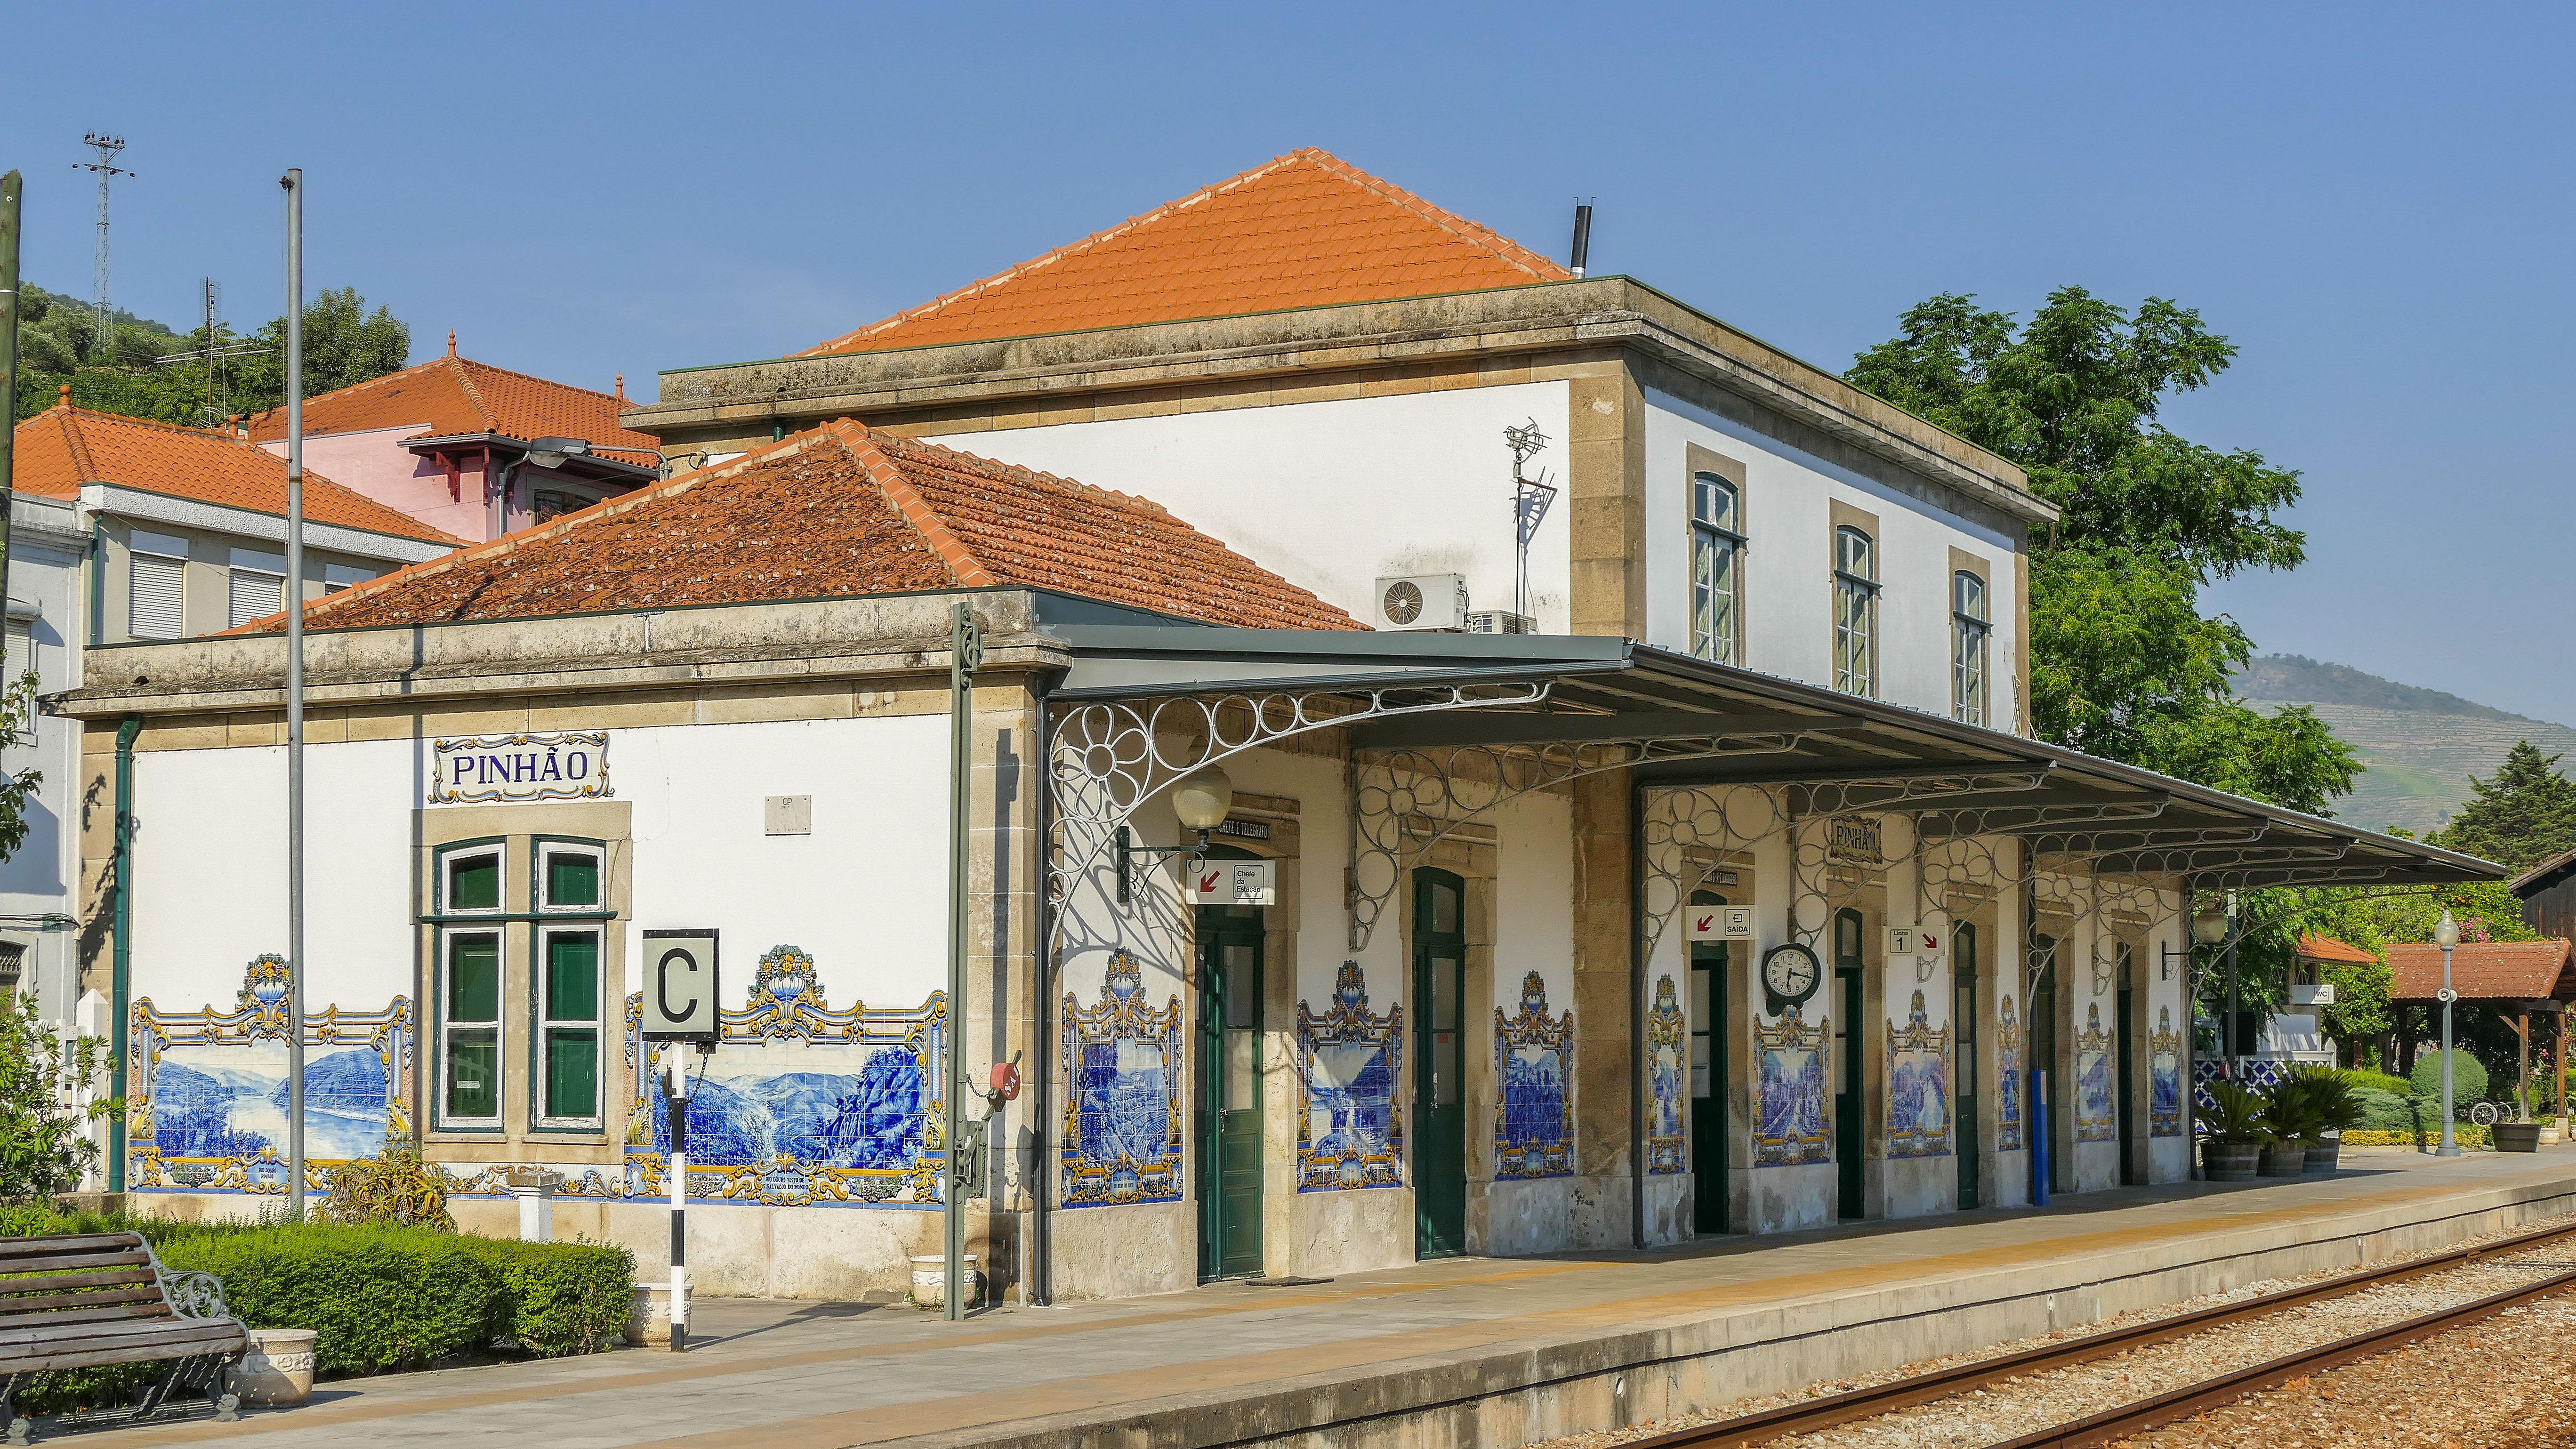 https://upload.wikimedia.org/wikipedia/commons/e/ef/Pinh%C3%A3o_Bahnhof.jpg